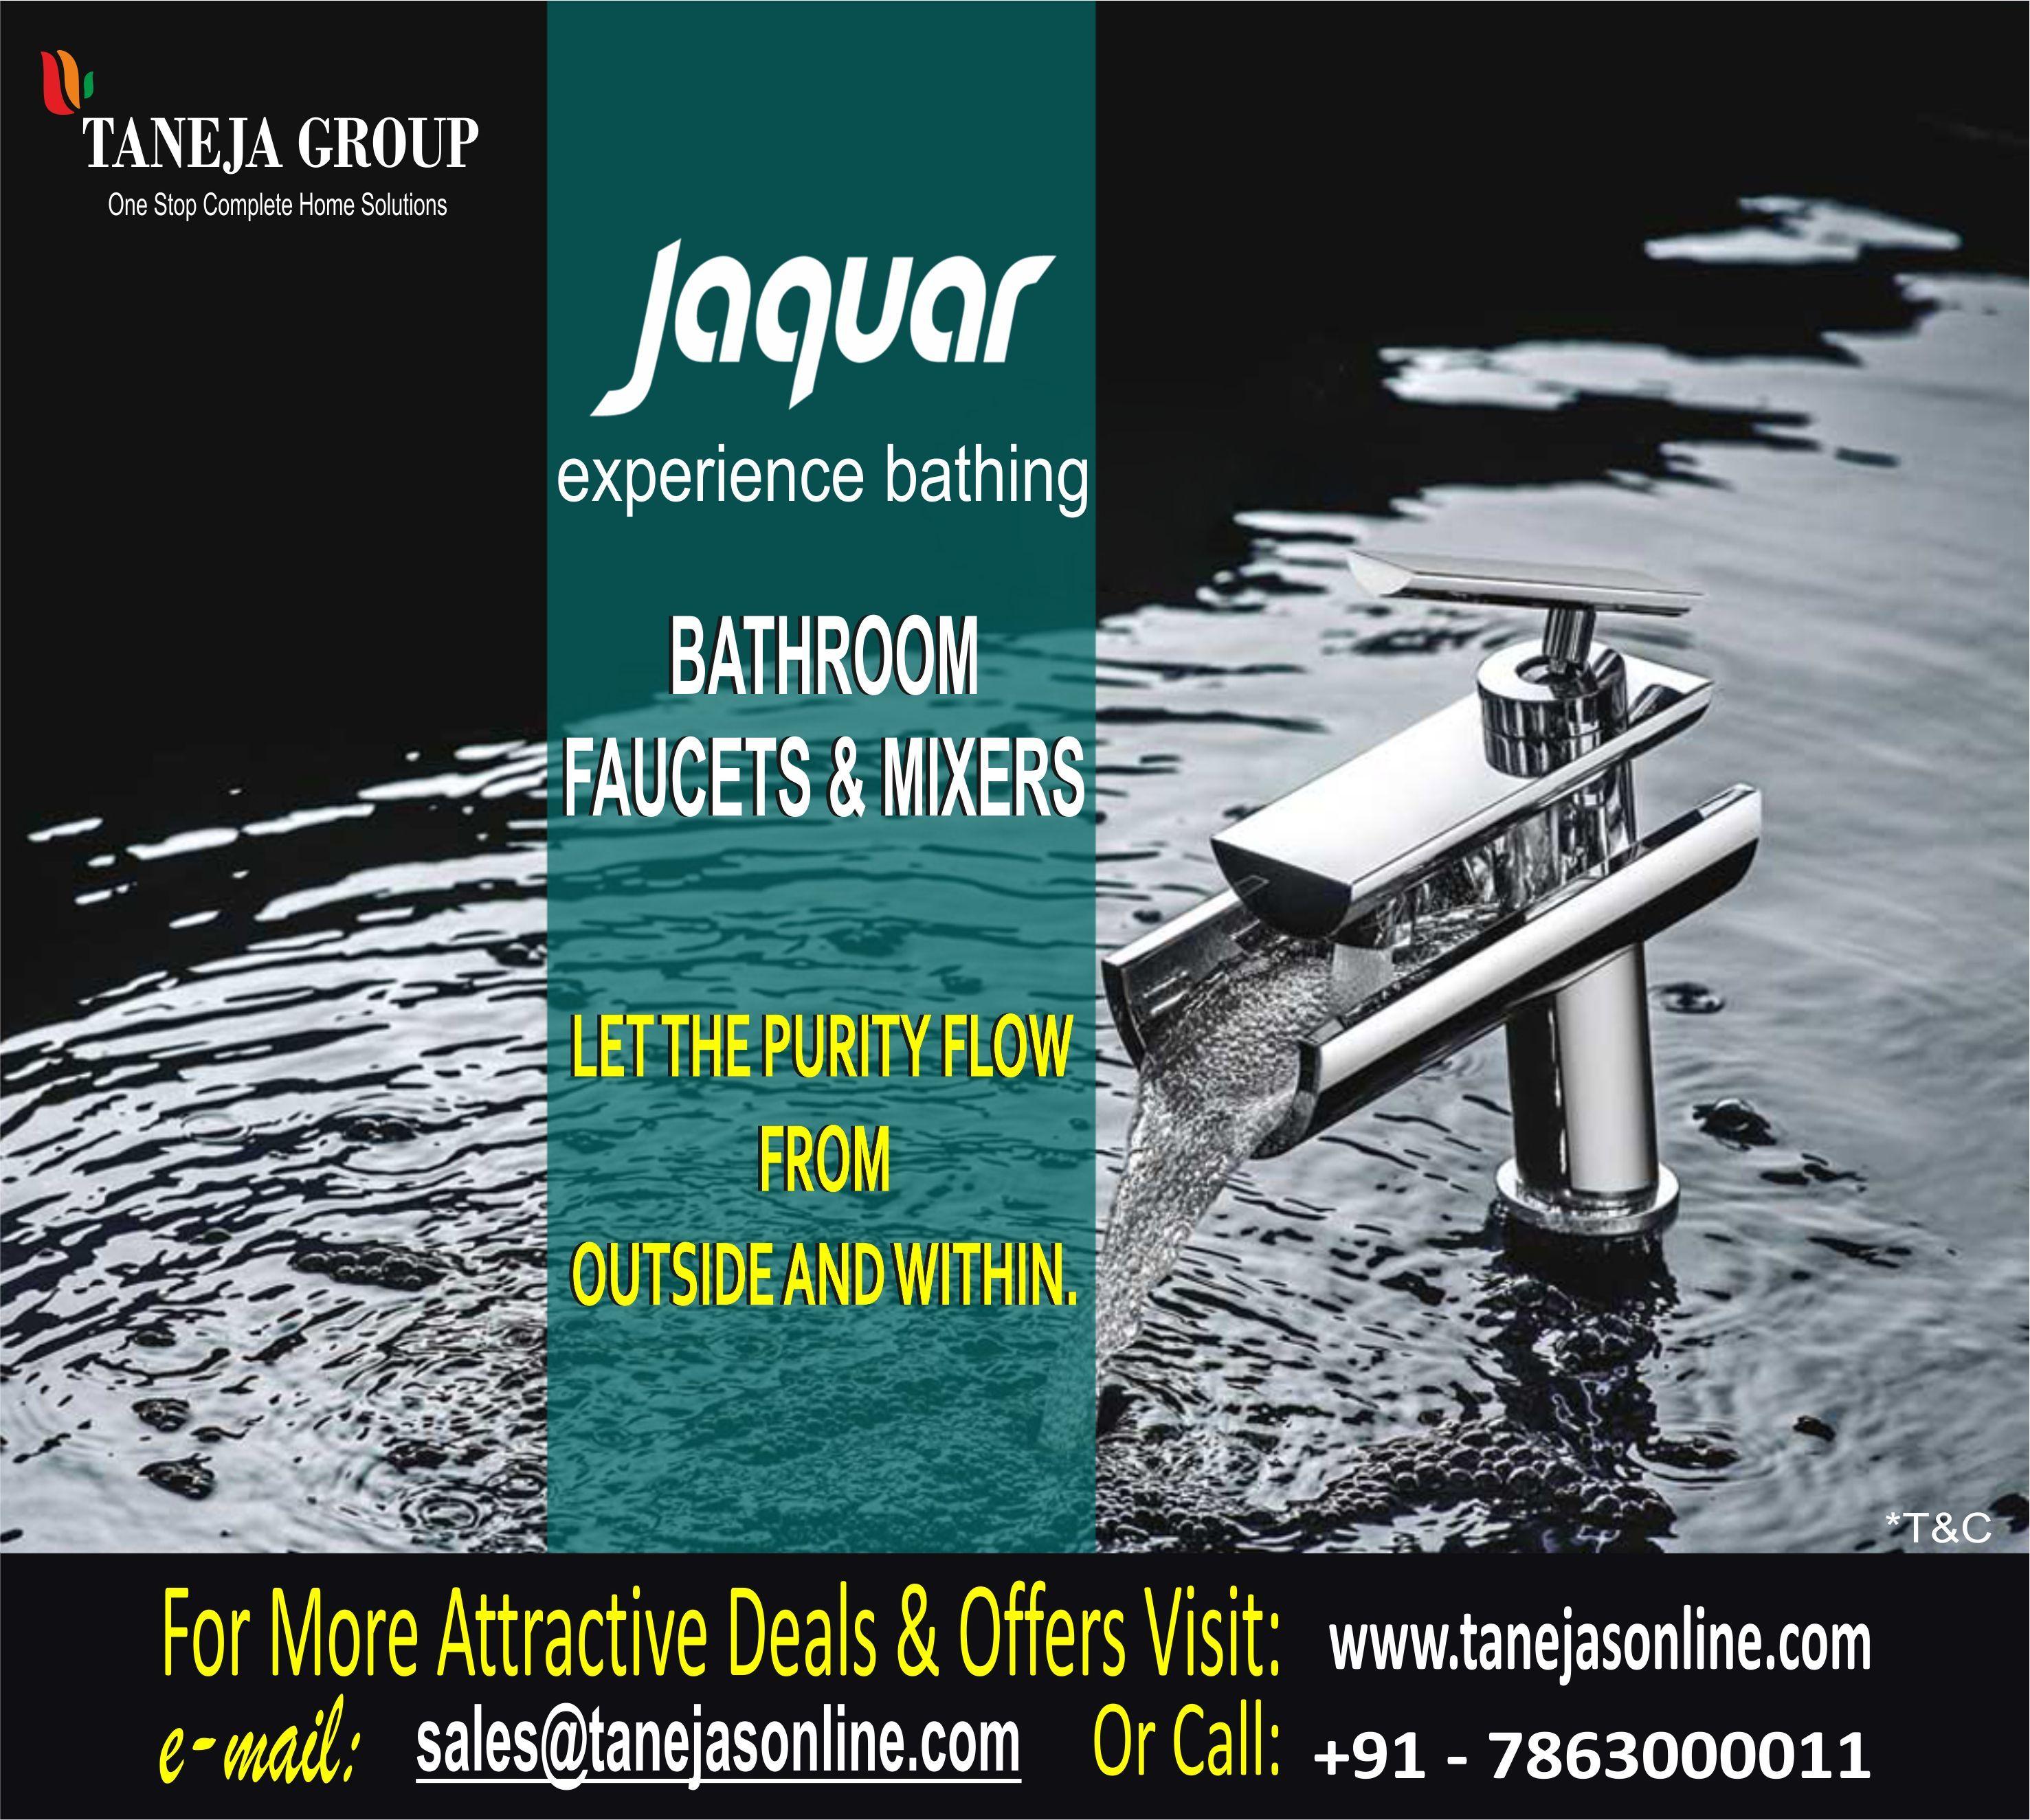 Prayag bathroom fittings price list - Prayag Bathroom Fittings Price List 42